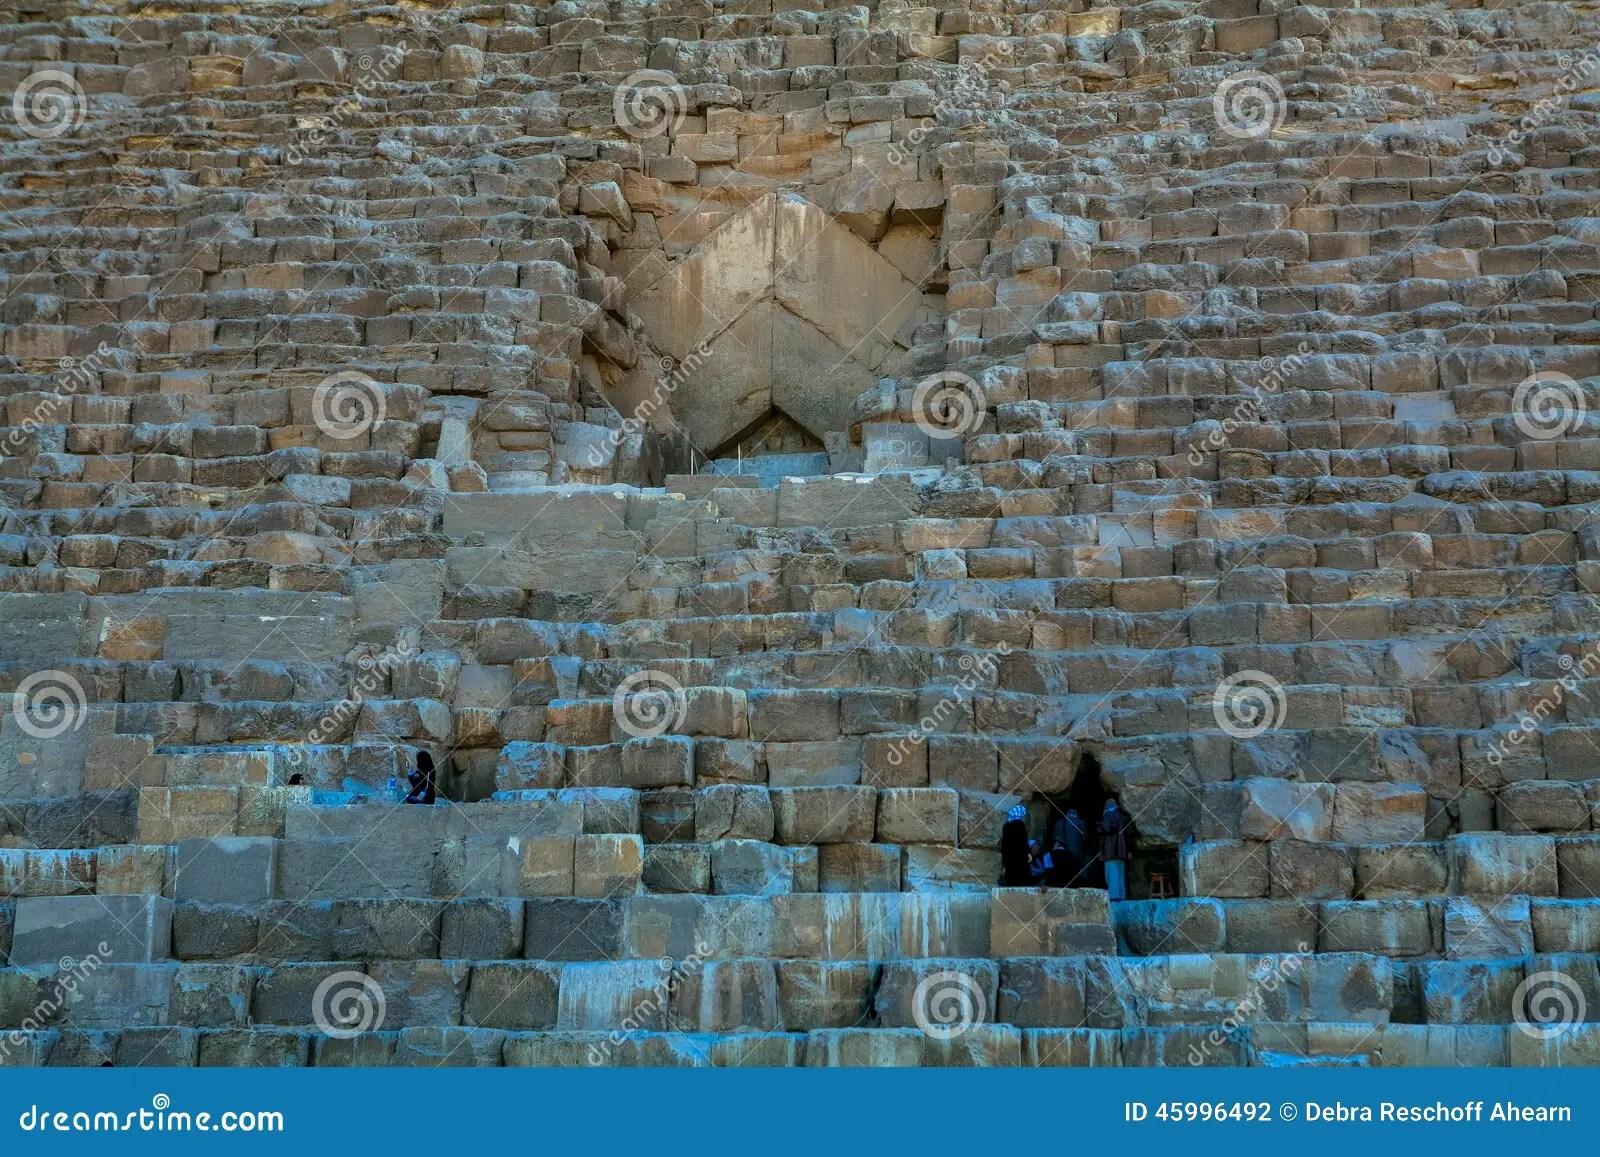 Building Great Sphinx